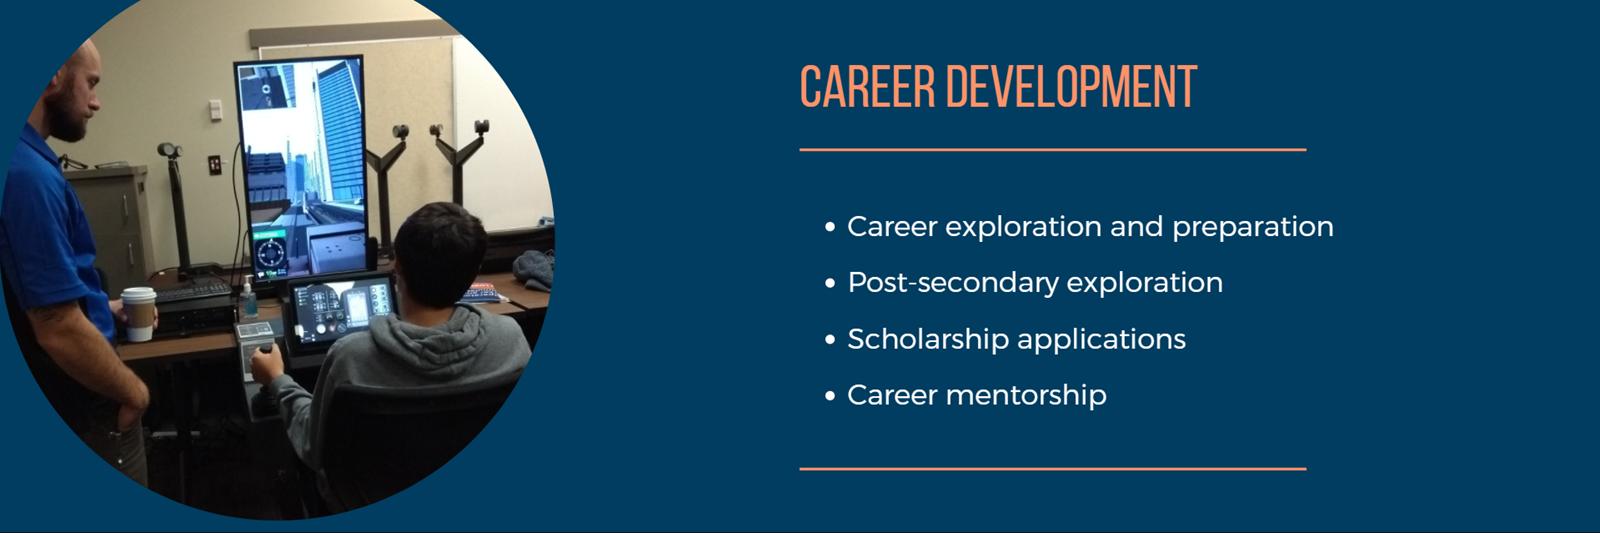 03 Career Development BrJrys.png